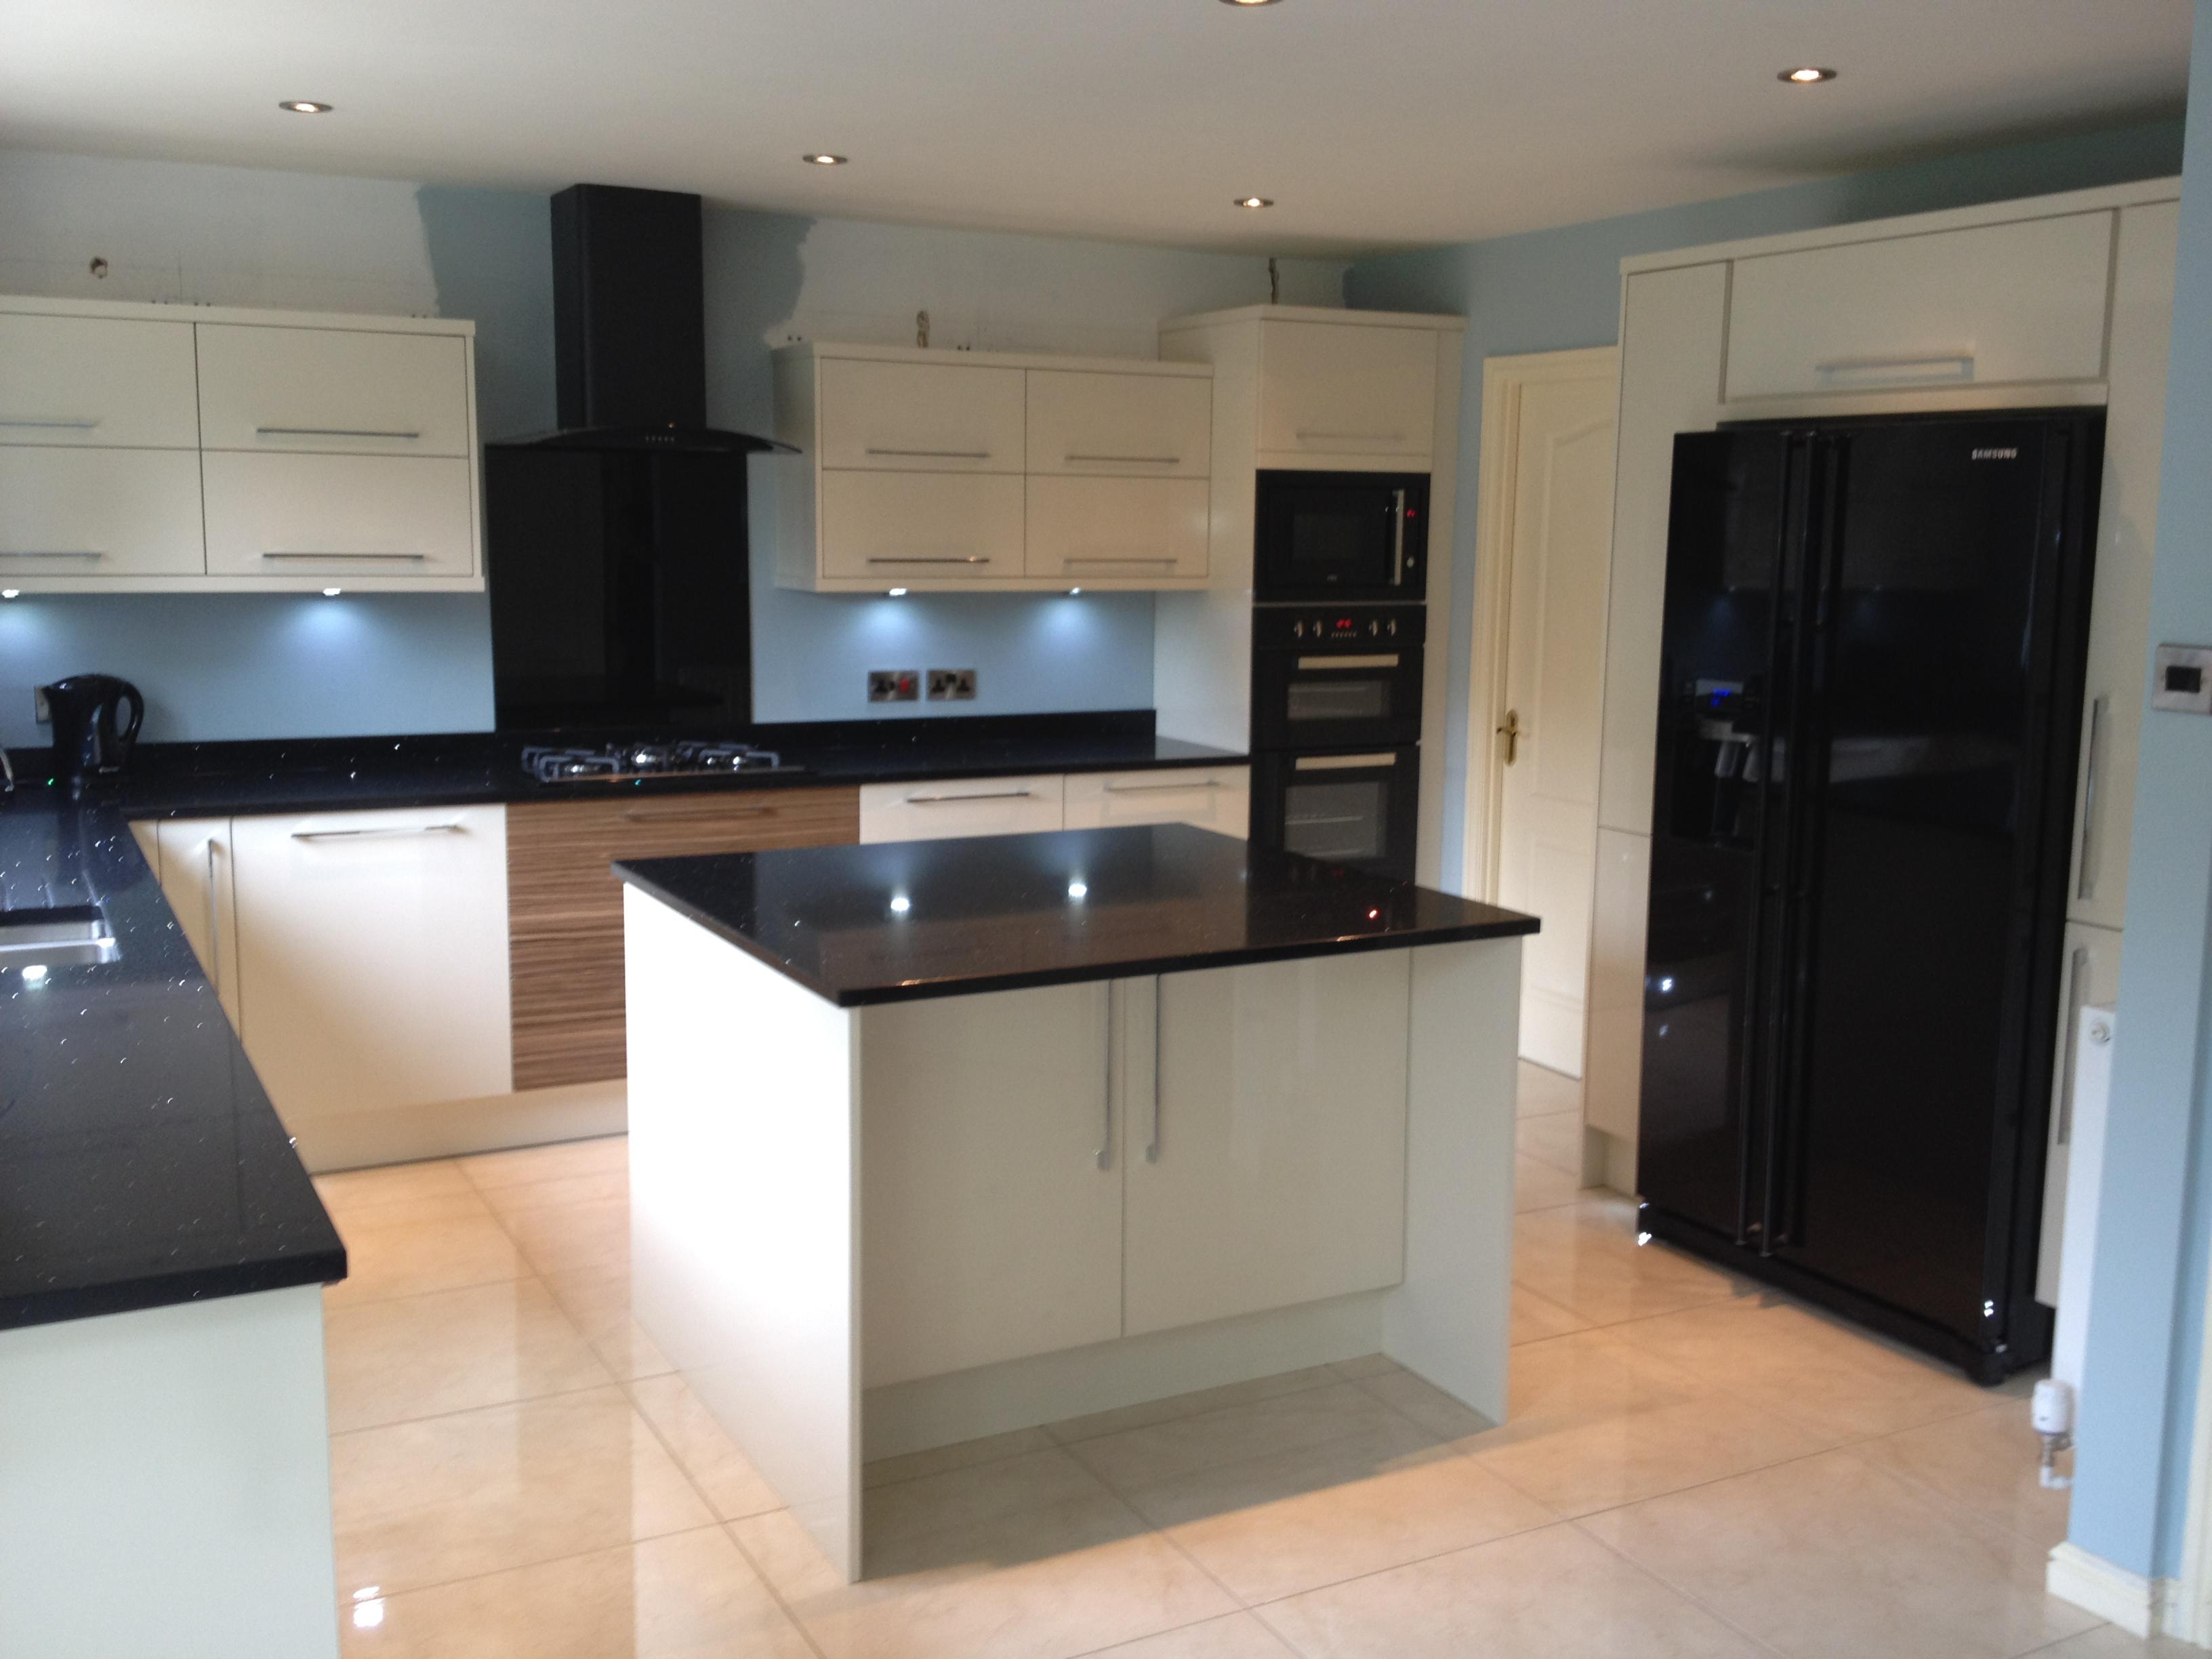 kitchen design ideas with black appliances photo - 2